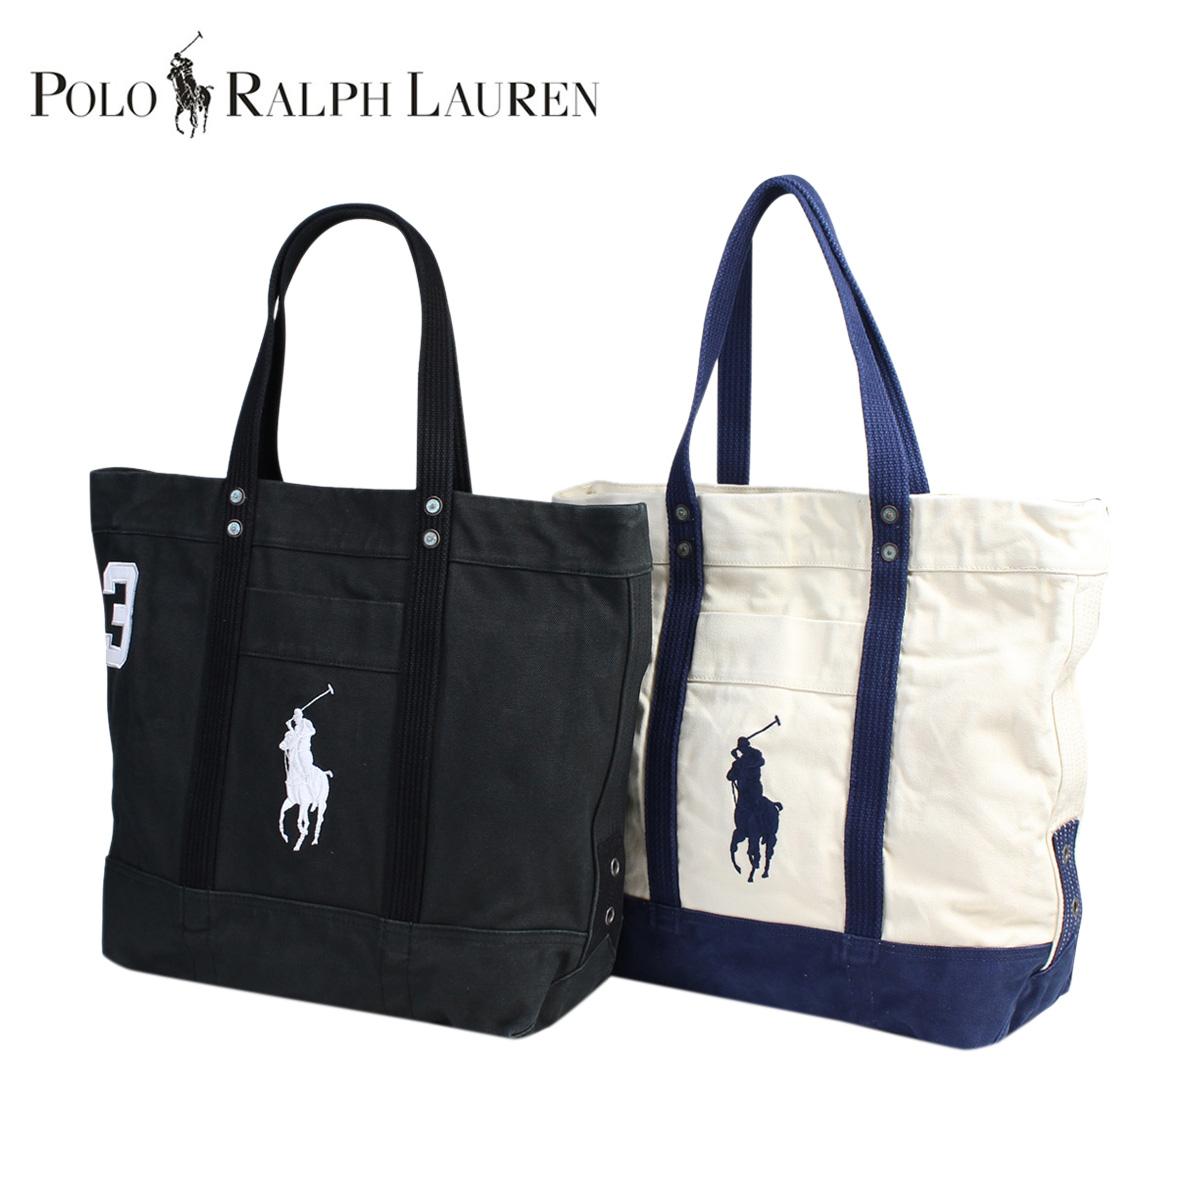 6af332cfabf RALPH LAUREN bag tote bag men gap Dis big pony POLO Ralph Lauren polo 2  color ...